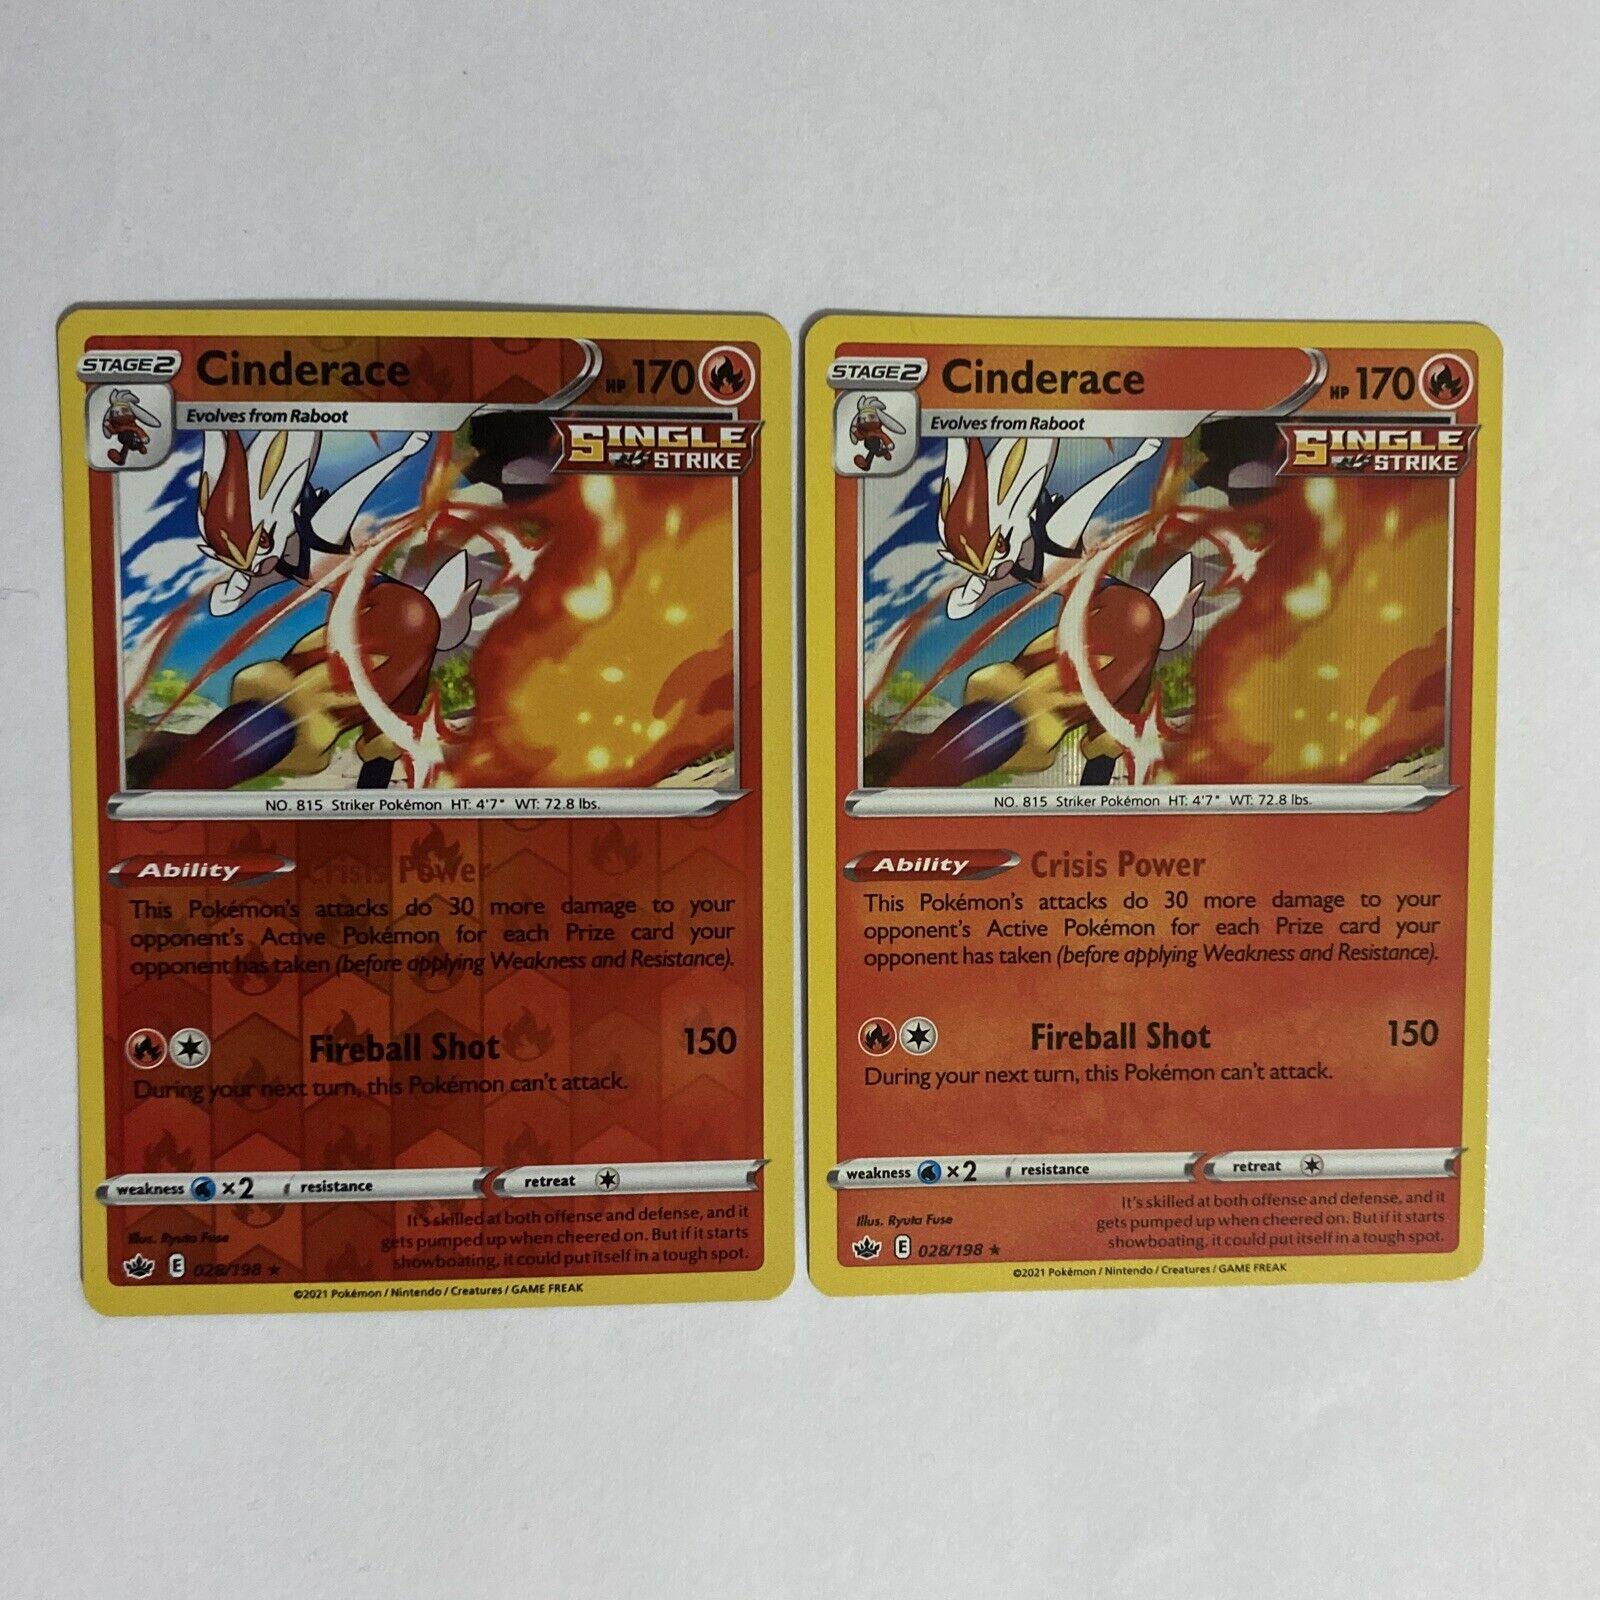 Pokemon - Cinderace - 028/198- Reverse Holo + Holo Rare - Chilling Reign - NM/M